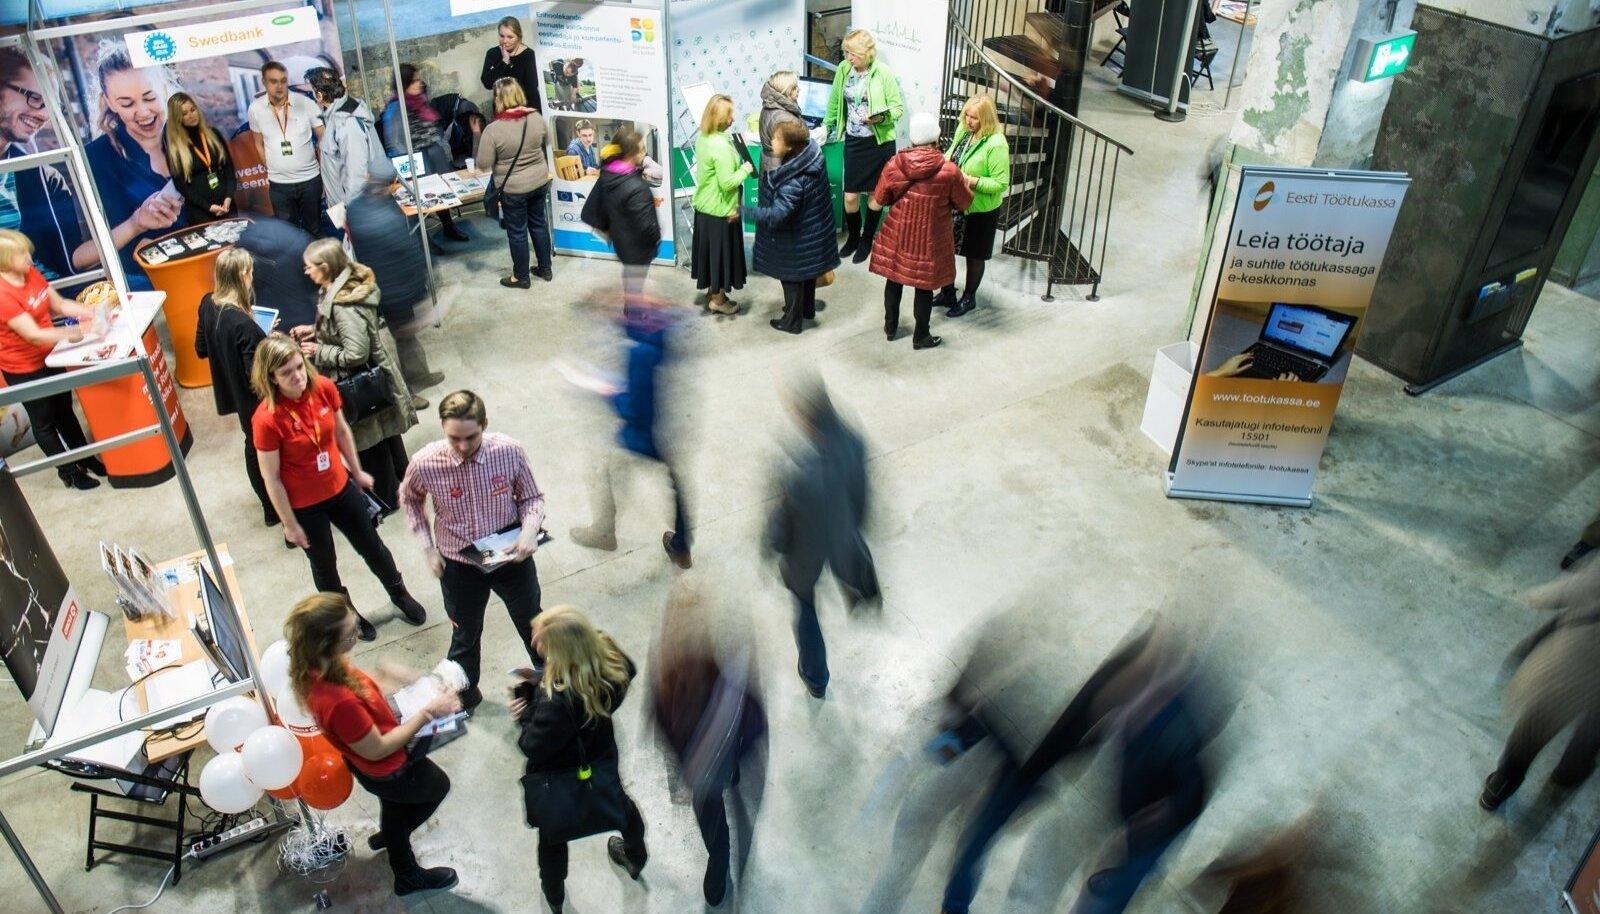 Töötukassa töö- ja karjäärimess Tallinnas Kultuurikatlas